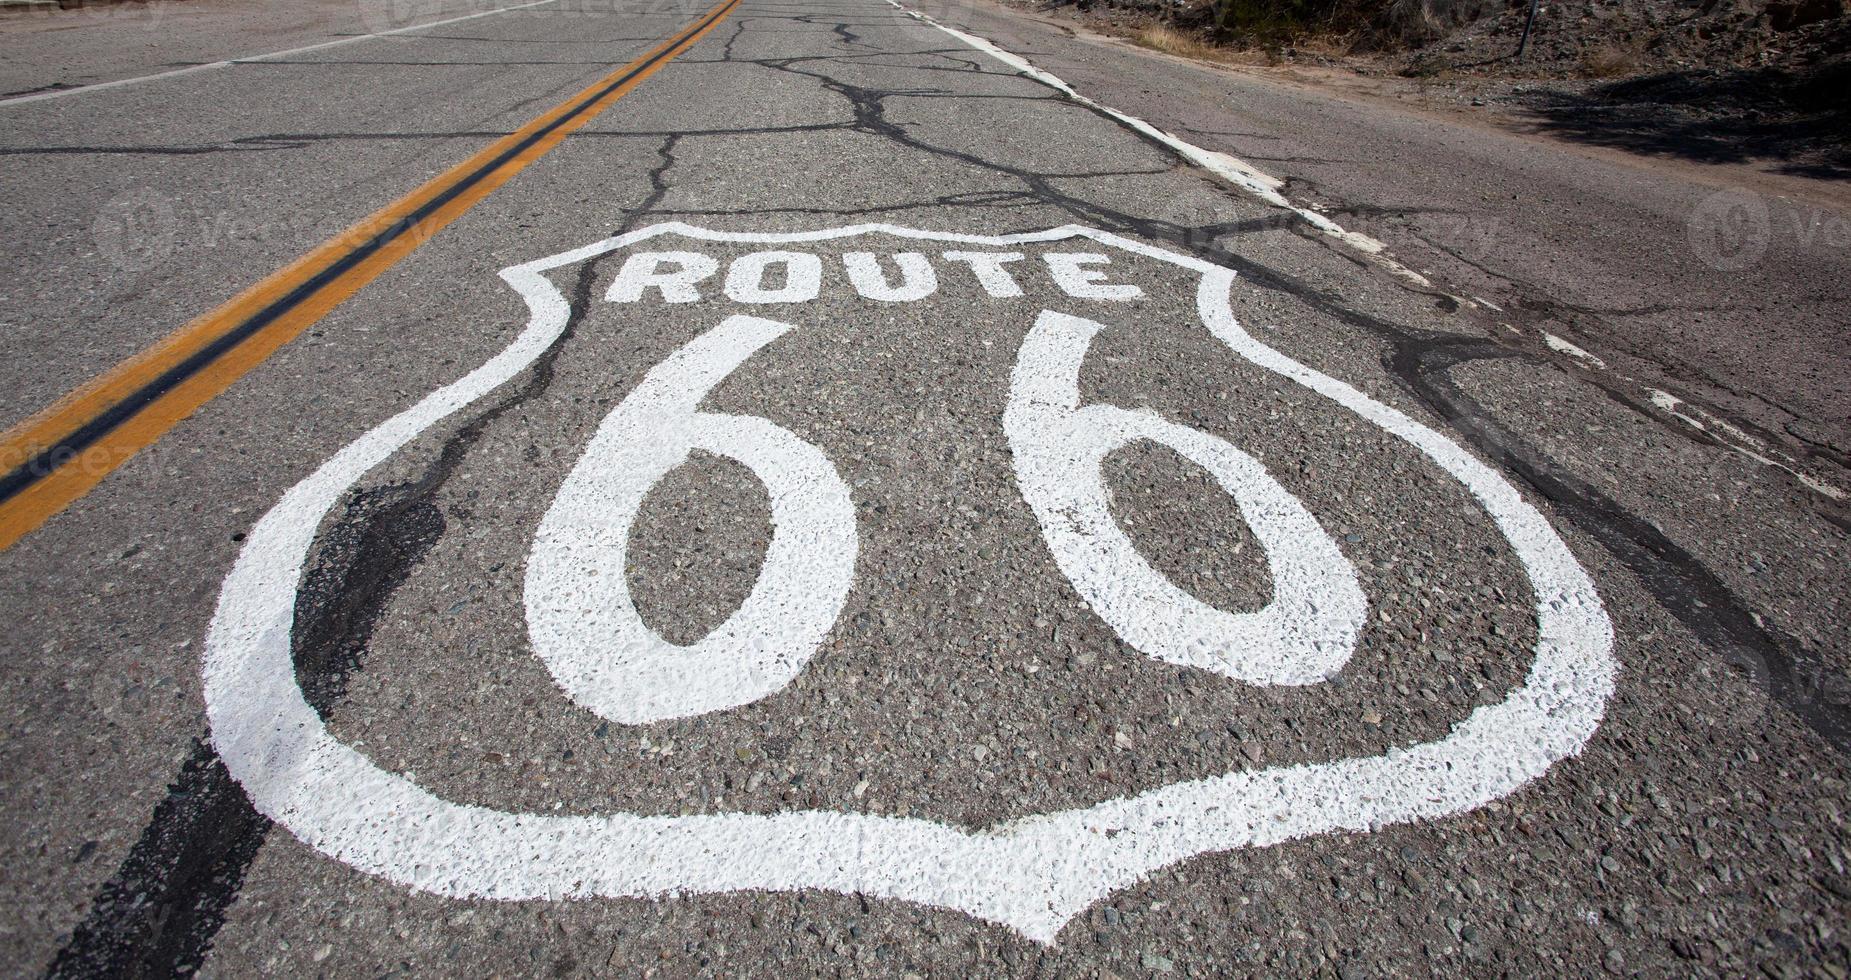 Antigua ruta 66 escudo pintado en carretera foto